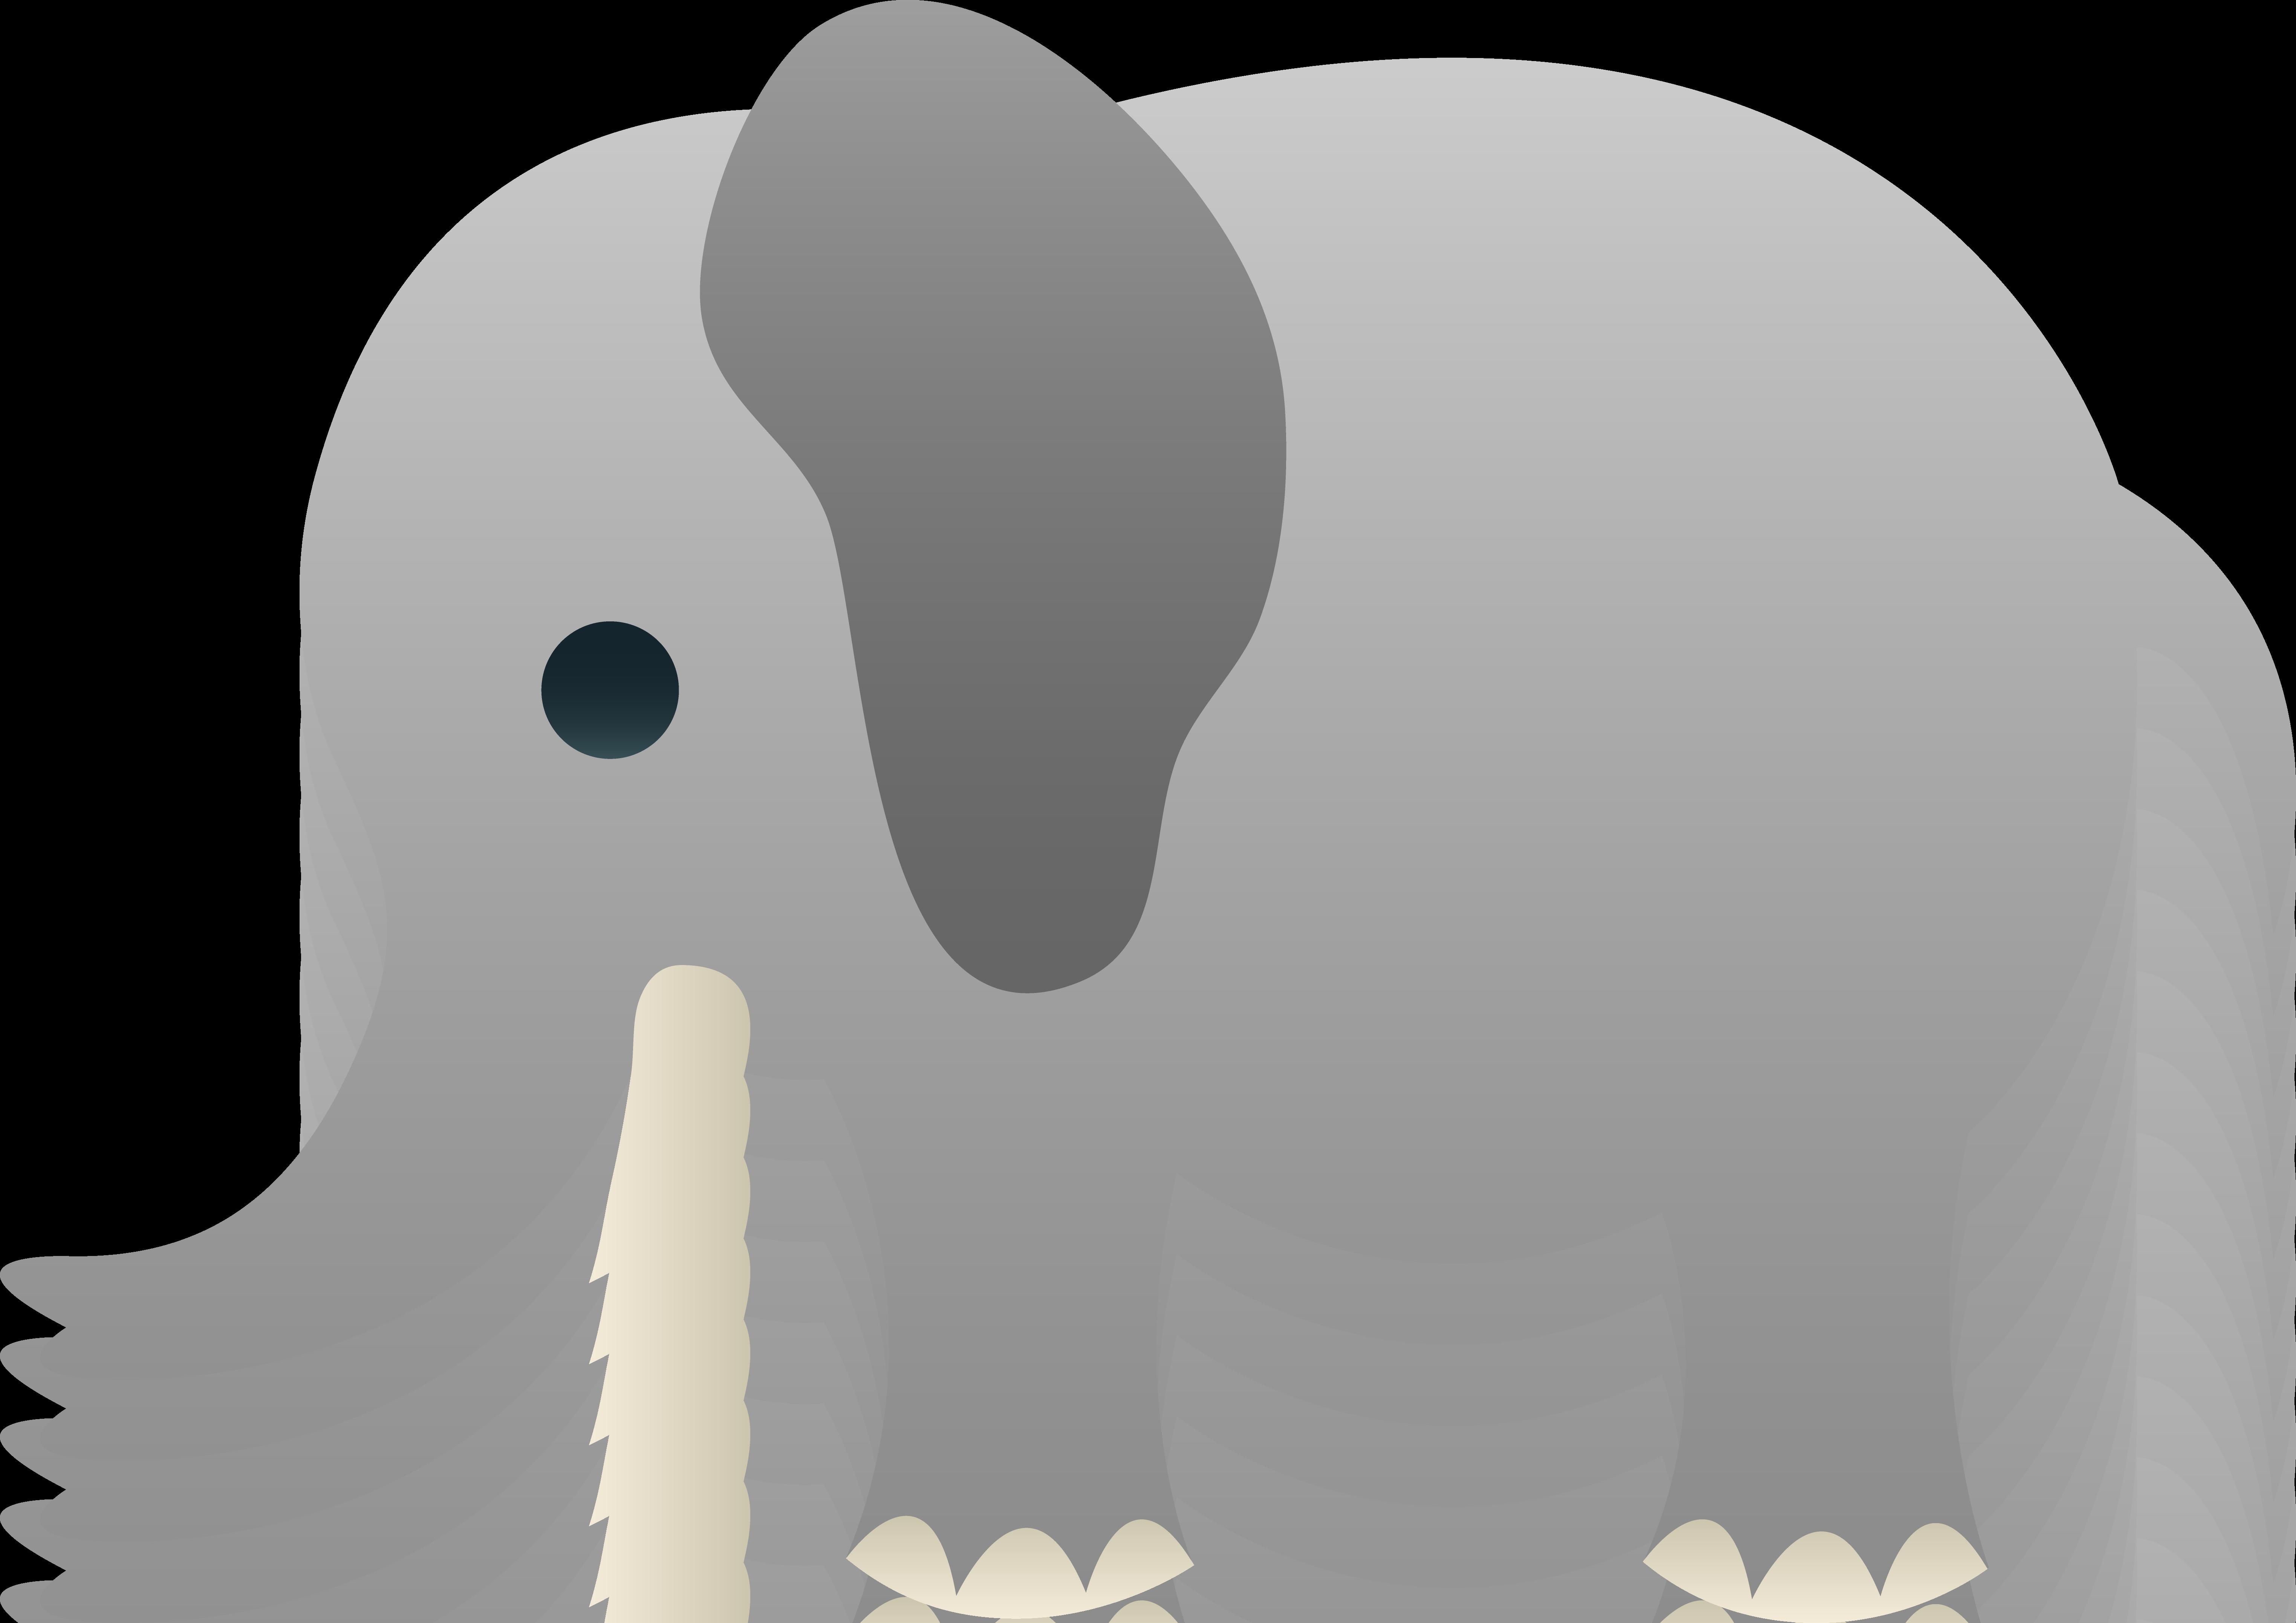 Clipart Baby Elephant - .-Clipart baby elephant - .-1